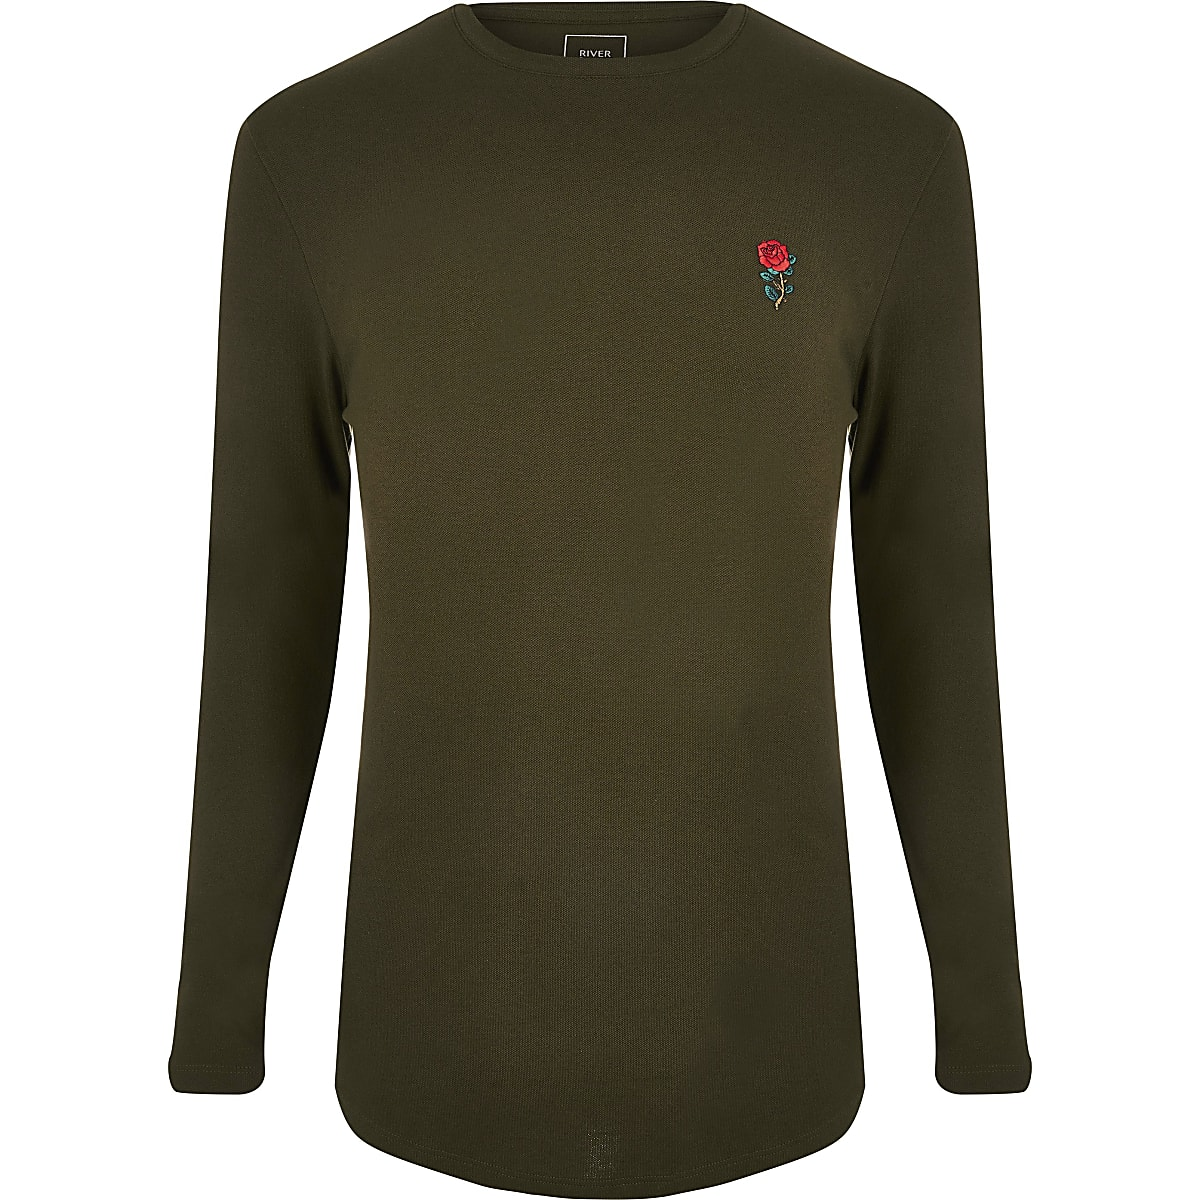 Dark green muscle fit long sleeve T-shirt